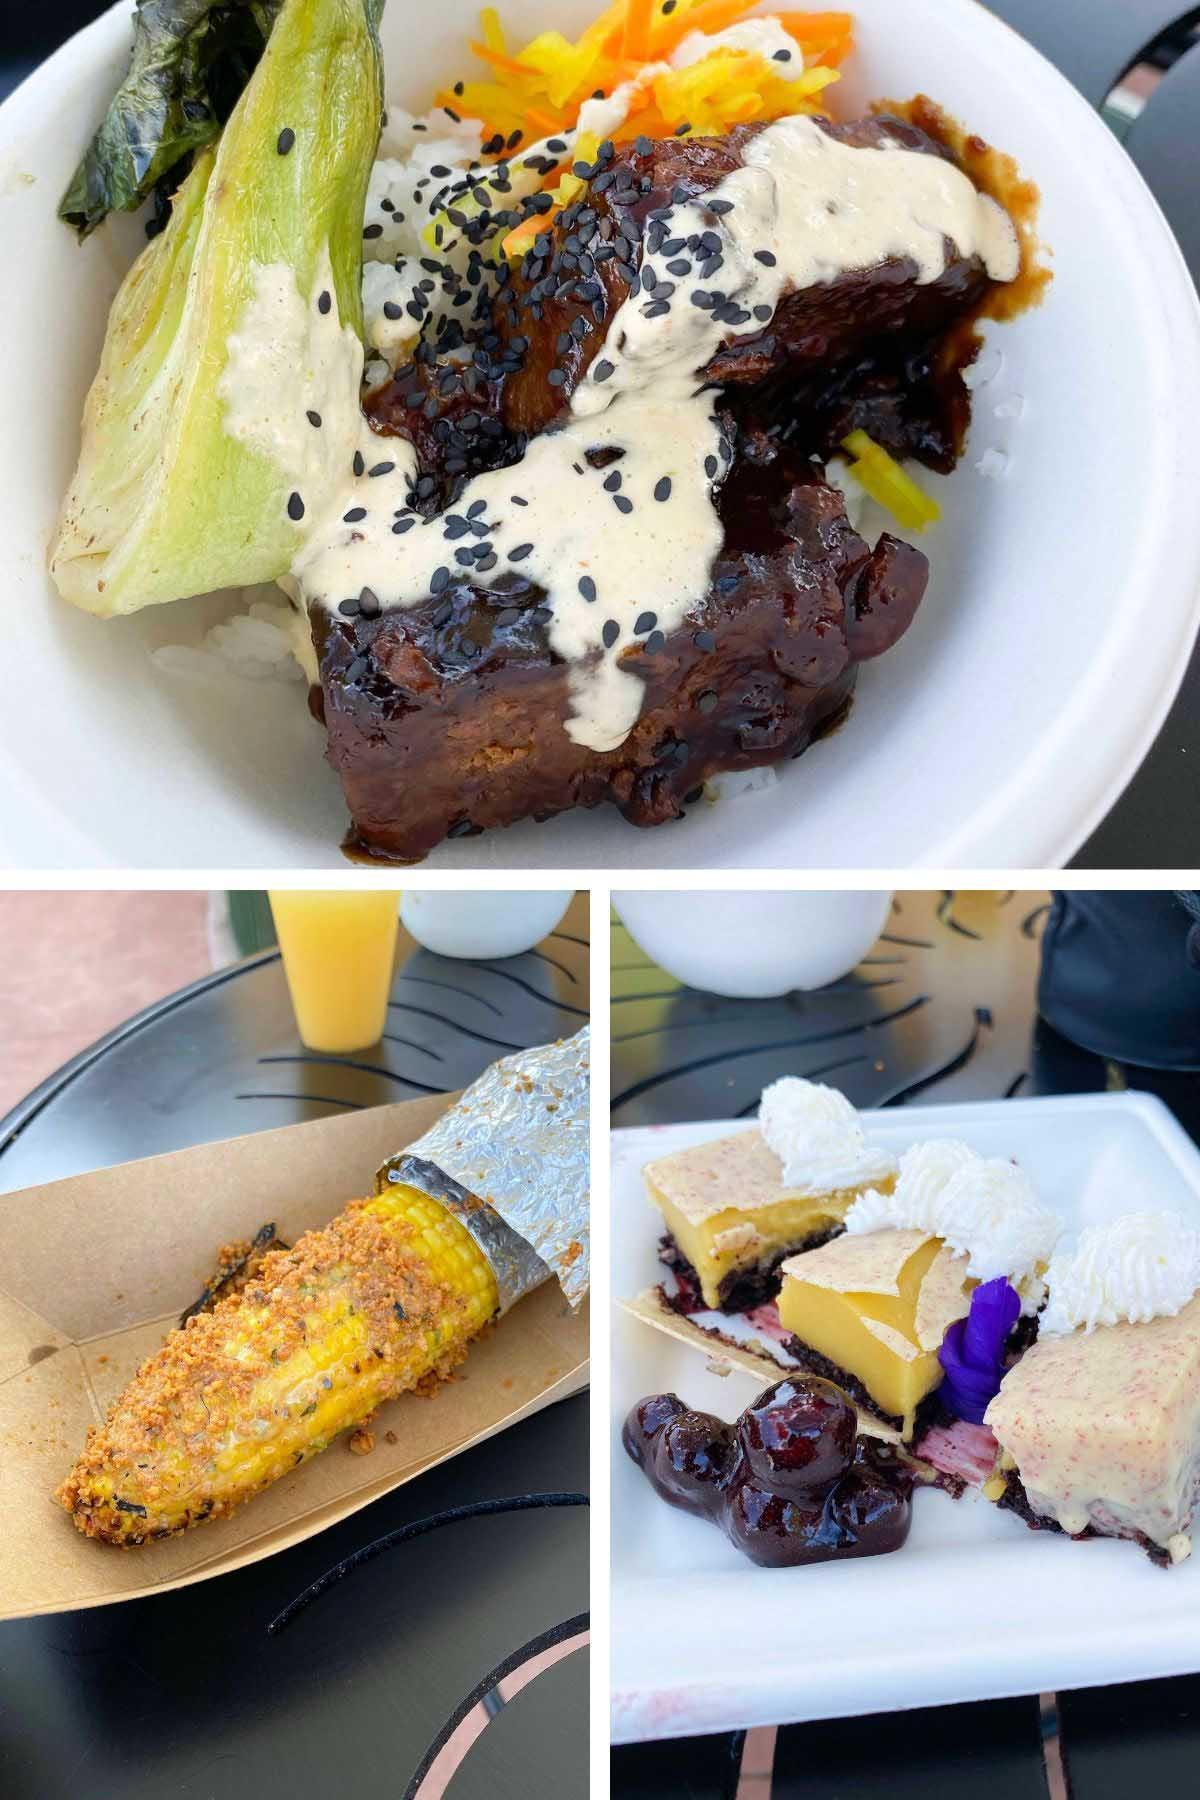 Impossible short rib, street corn, and lavender pots de creme